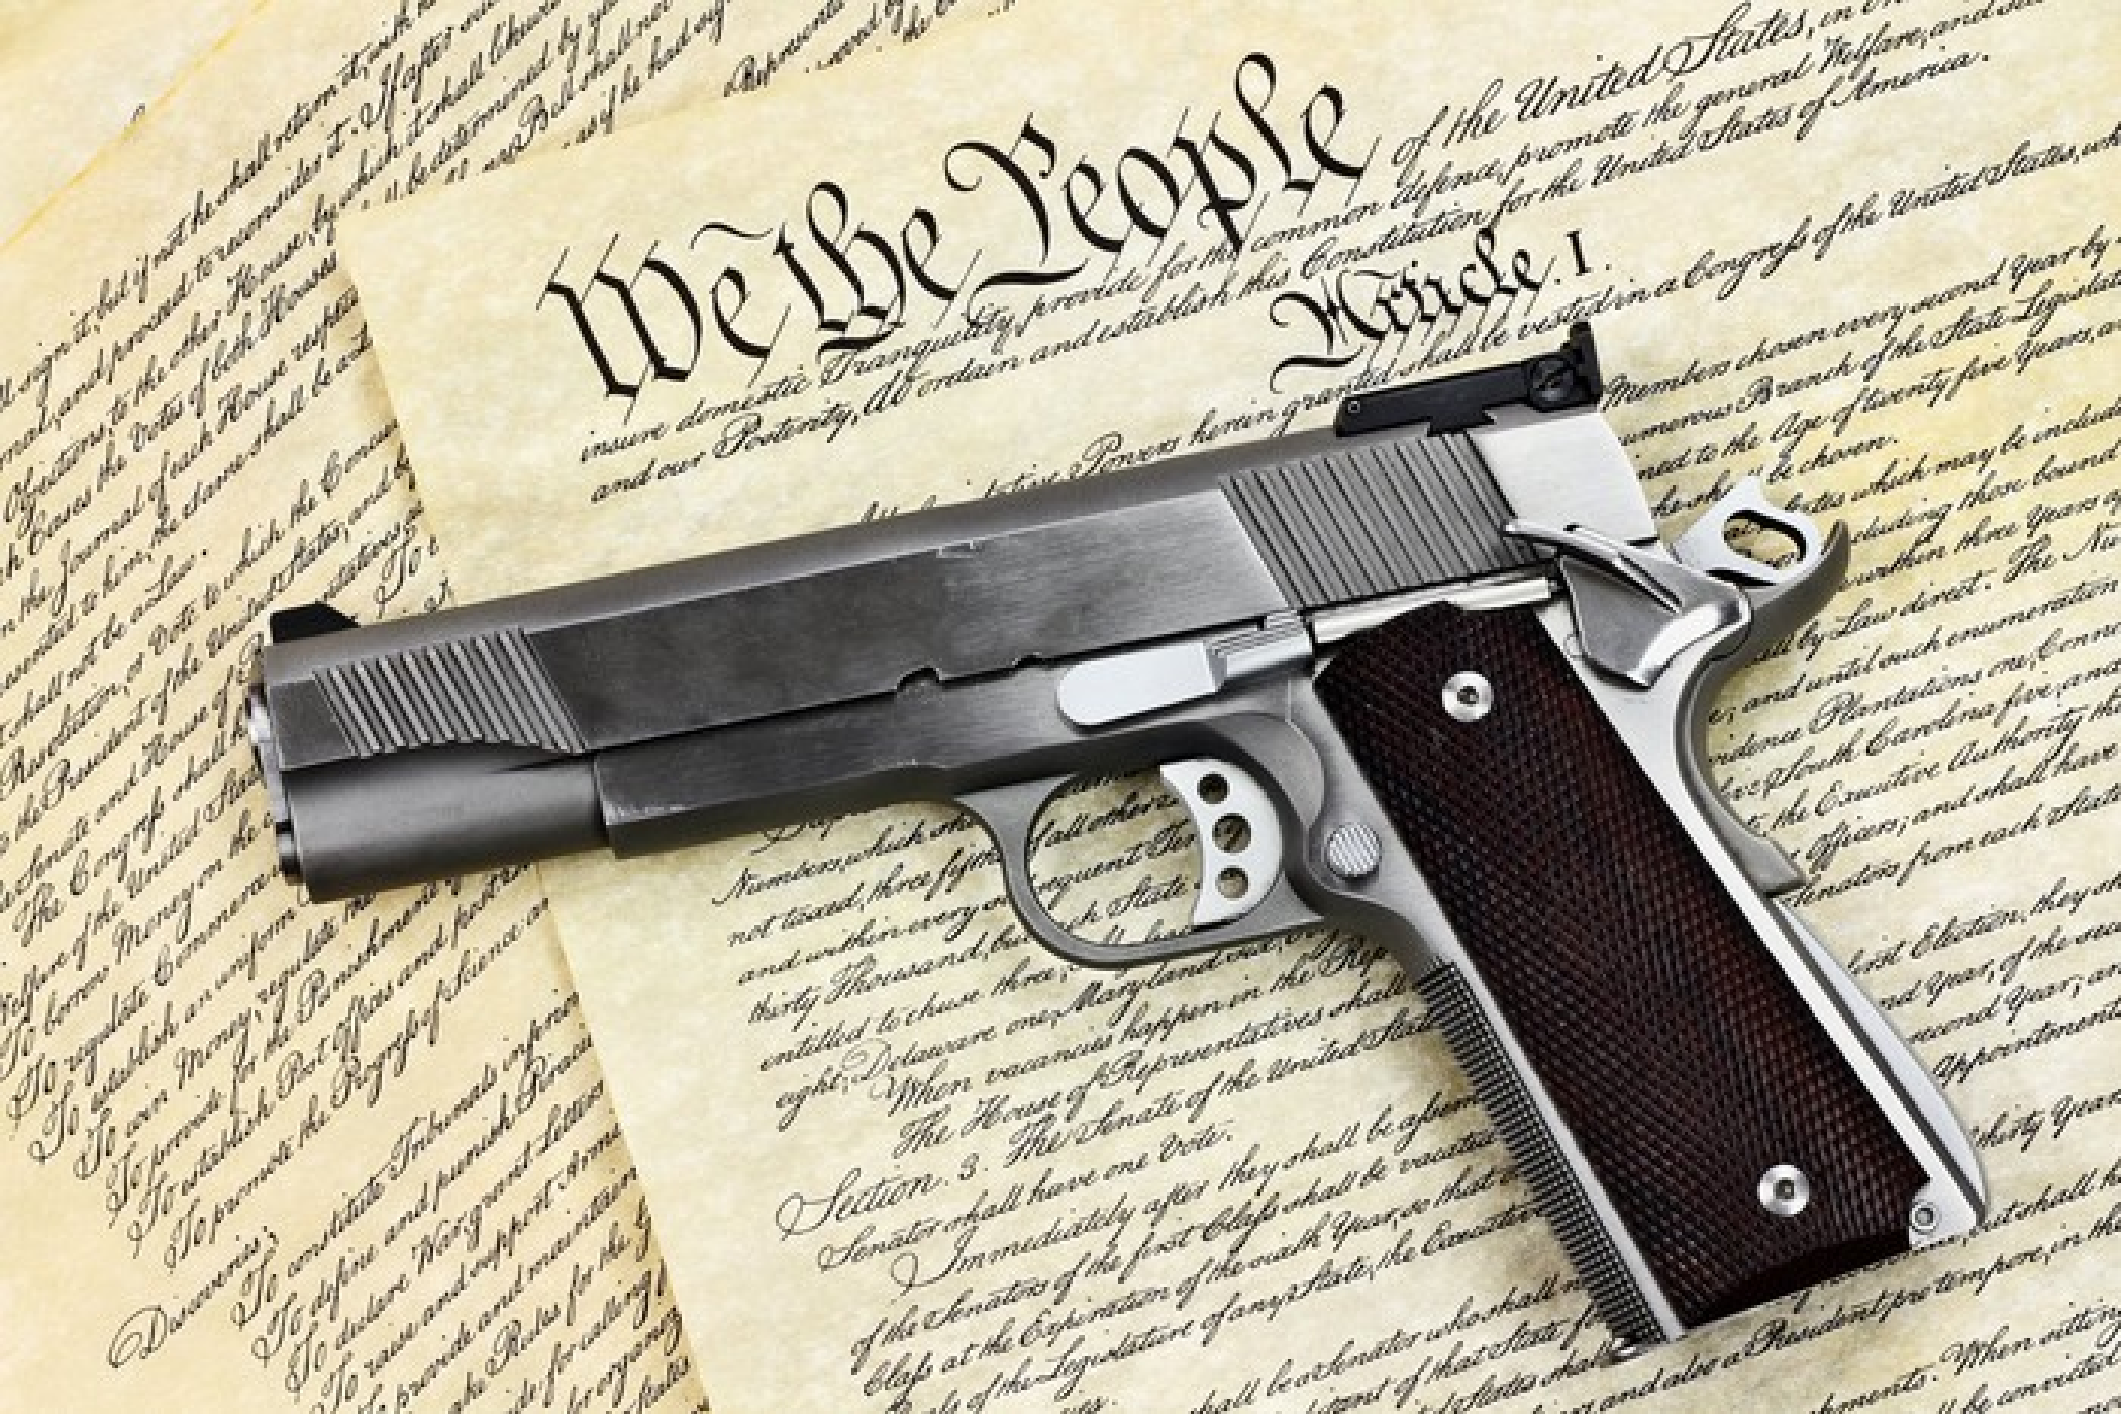 American Outdoor Brands' Shareholders Get Report Defending Smith & Wesson